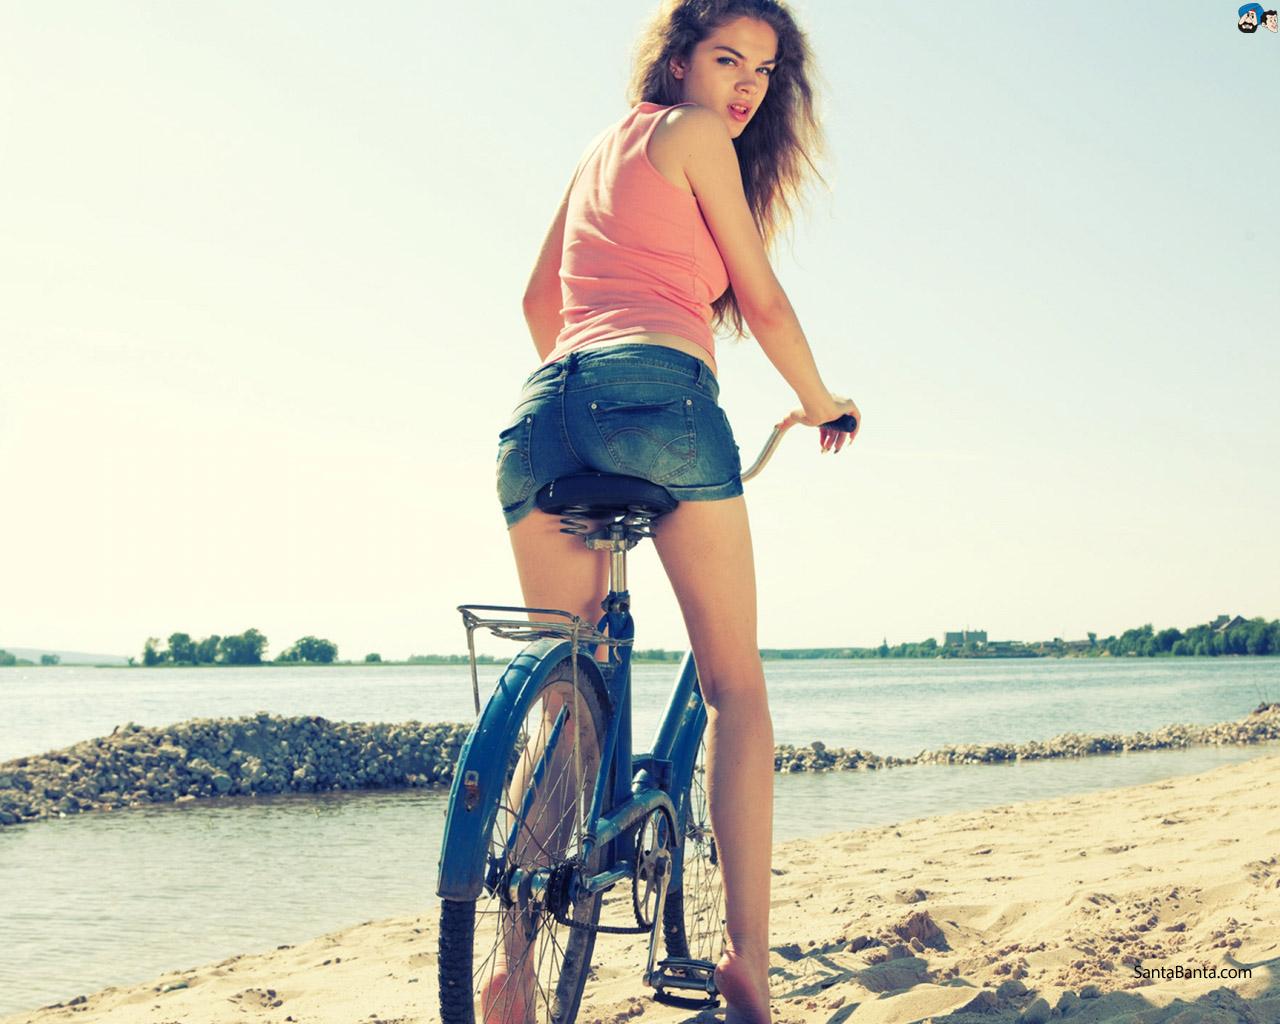 Korean Girl Wallpaper Desktop Download Bicycle Wallpapers Hd Most Beautiful Places In